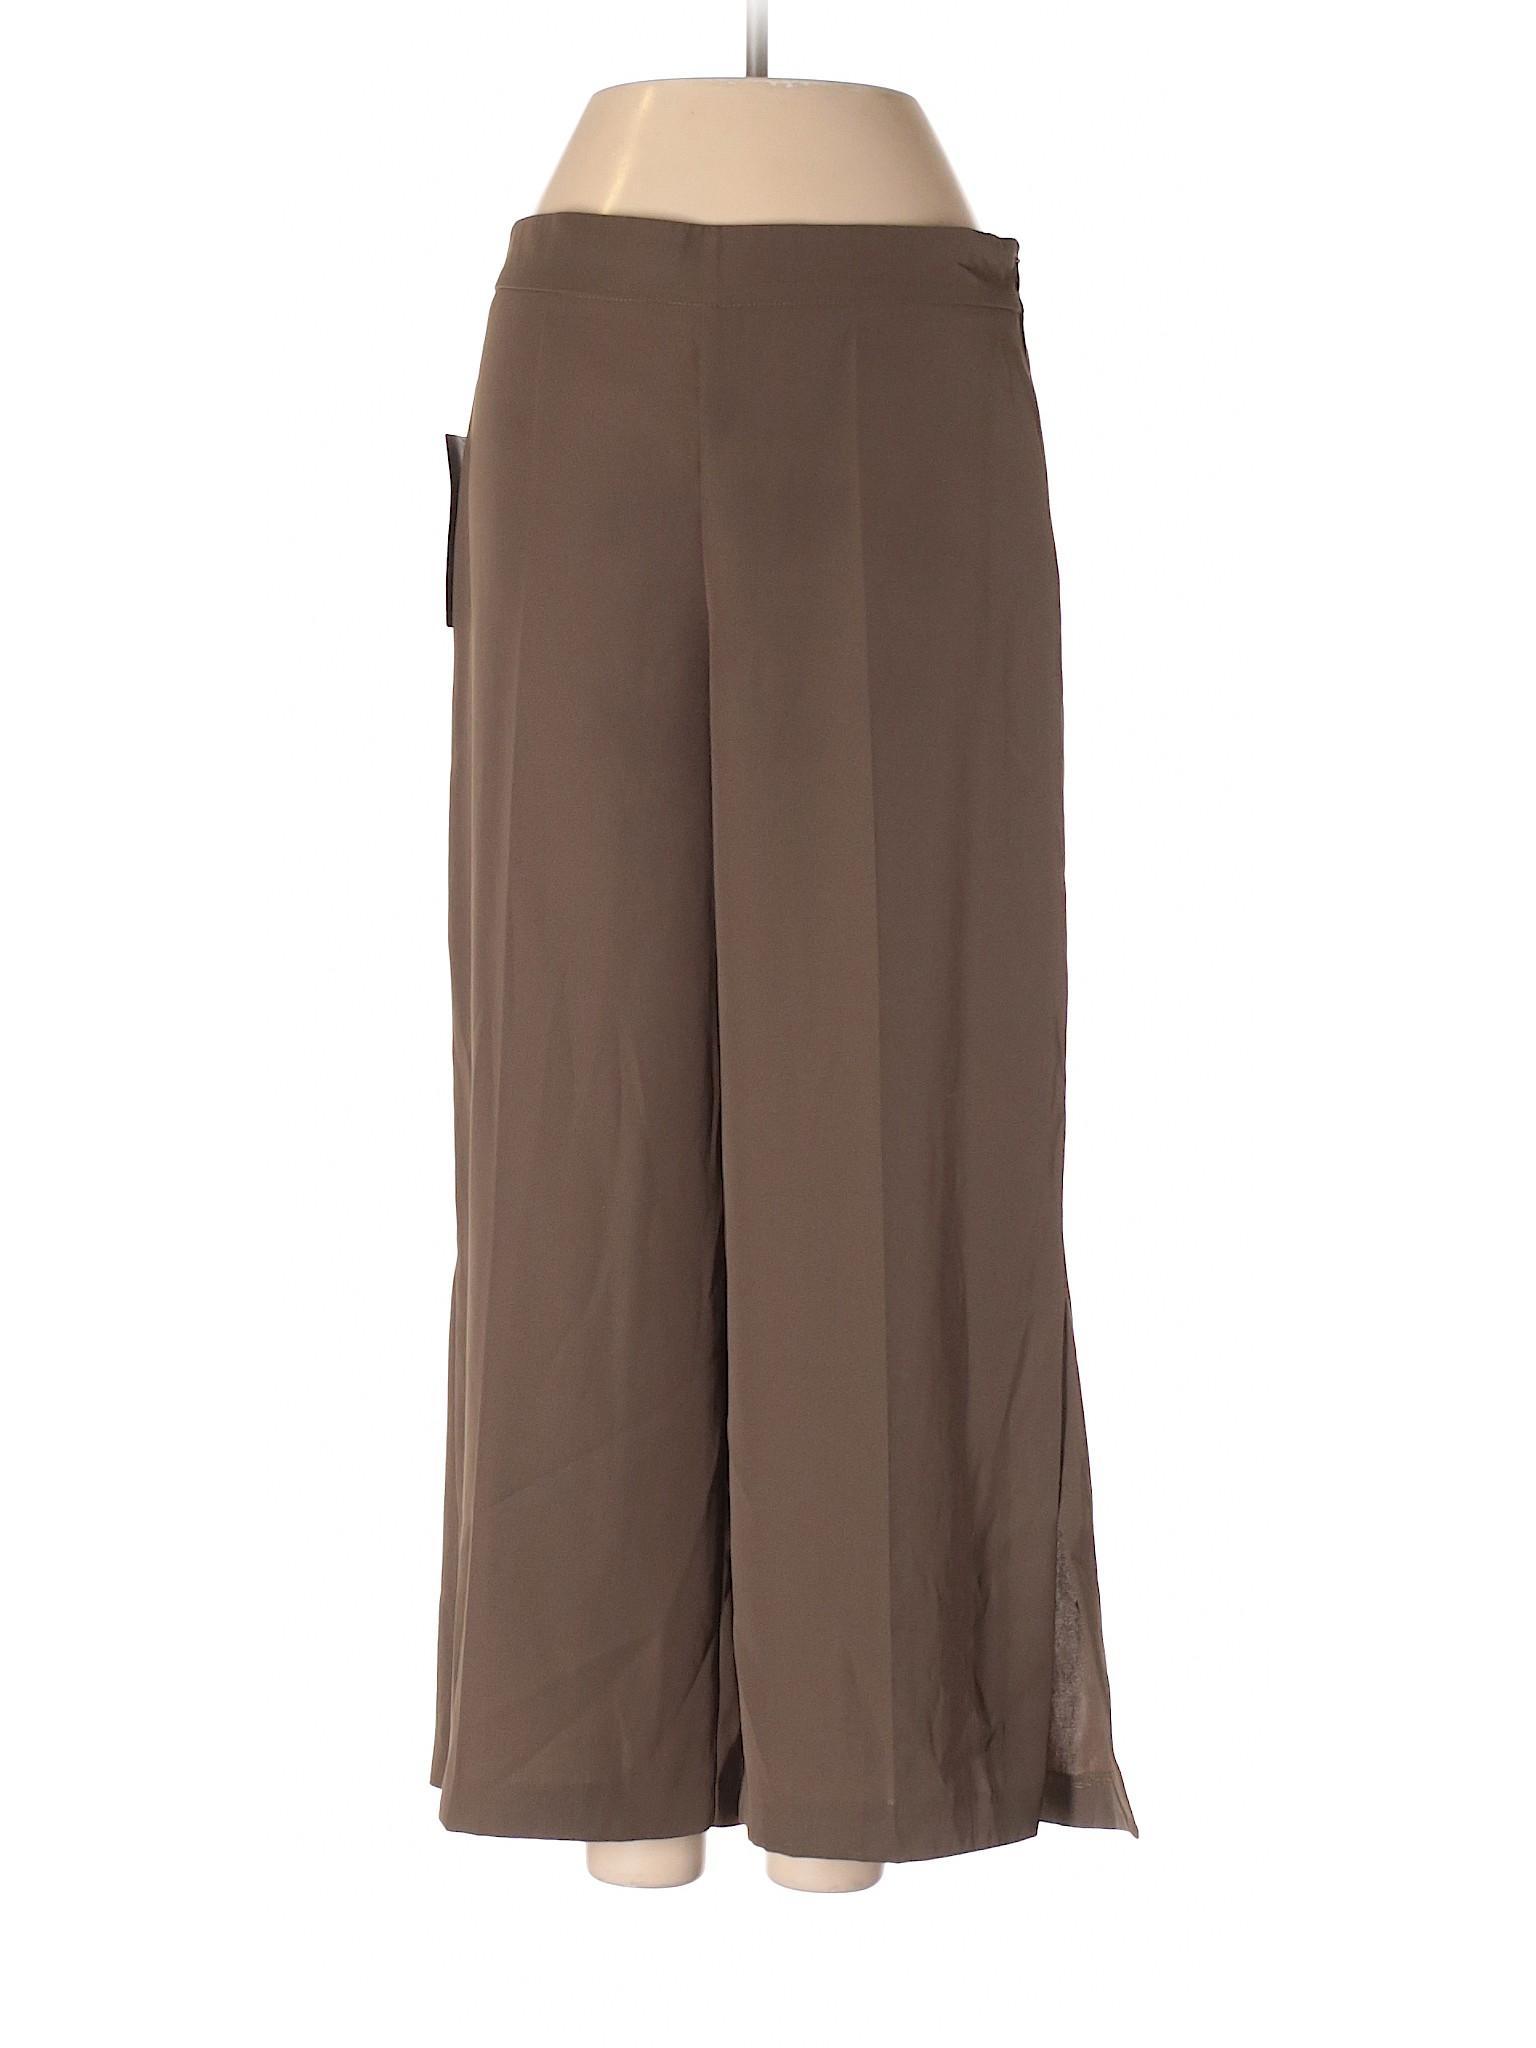 Boutique Boutique Zara Basic Pants Zara Casual Pants Boutique Casual Casual Basic Zara Basic Pants 6RrW6Tqwn